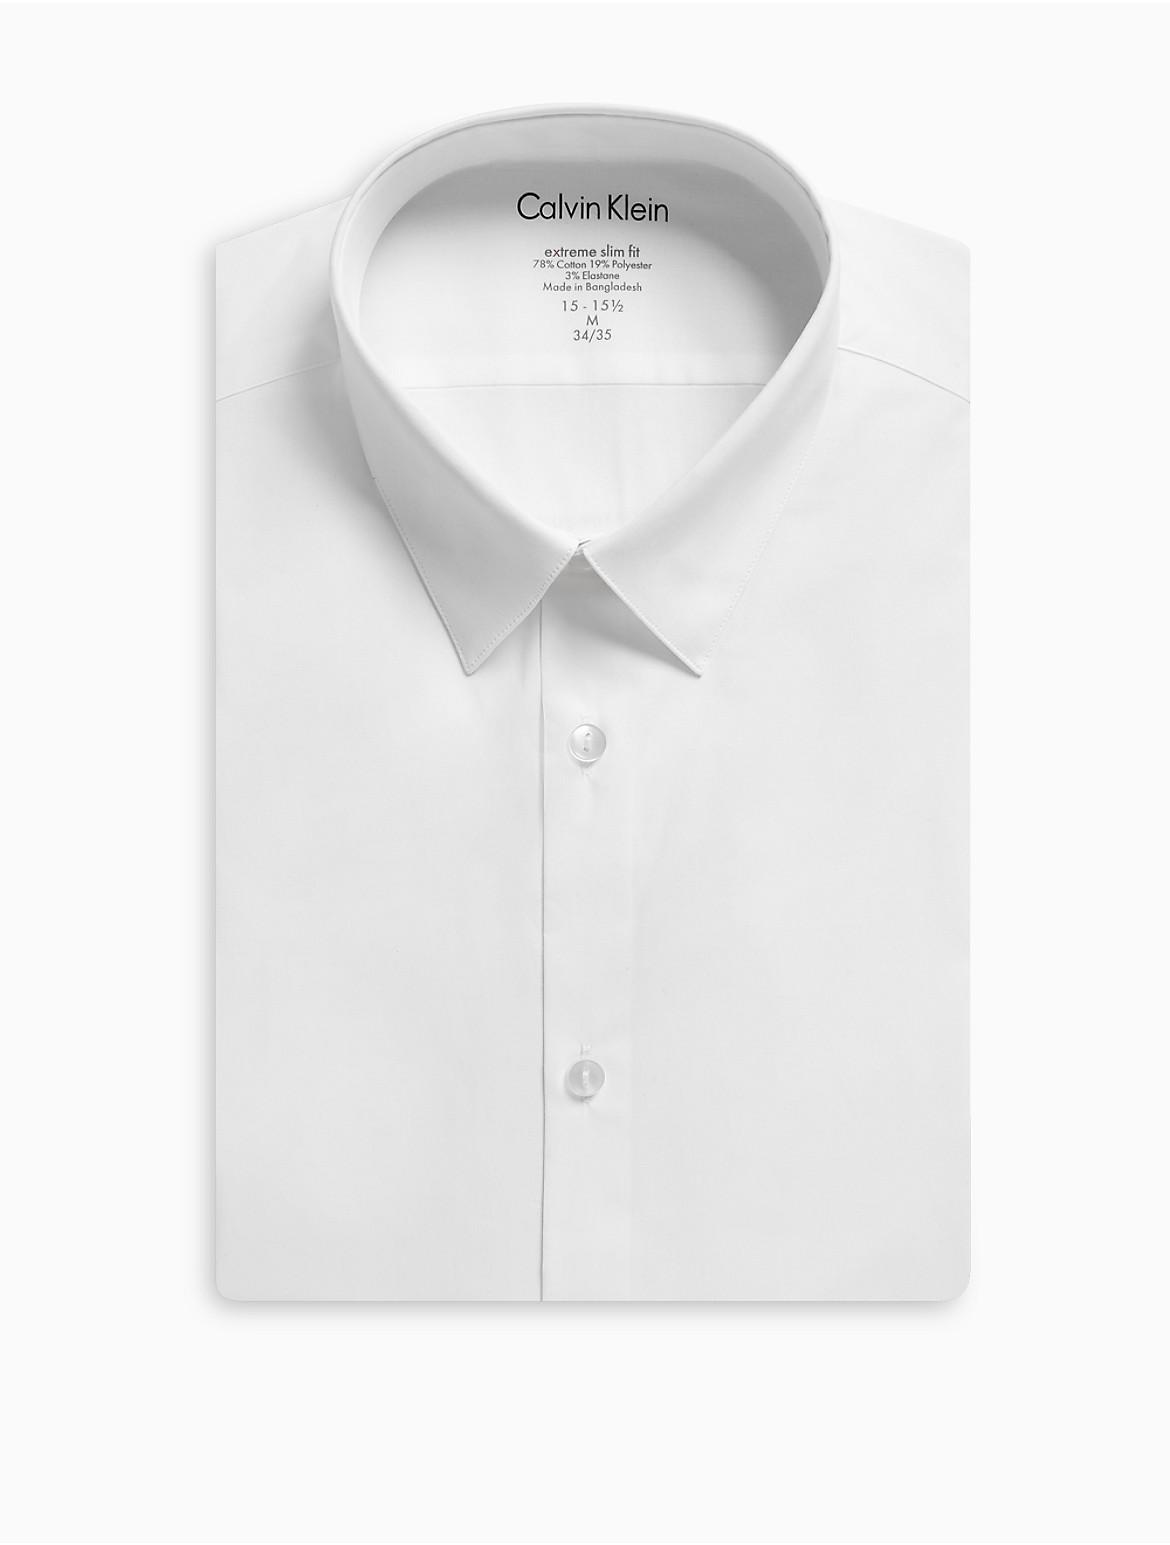 X Fit Ultra Slim Fit Solid Dress Shirt Calvin Klein